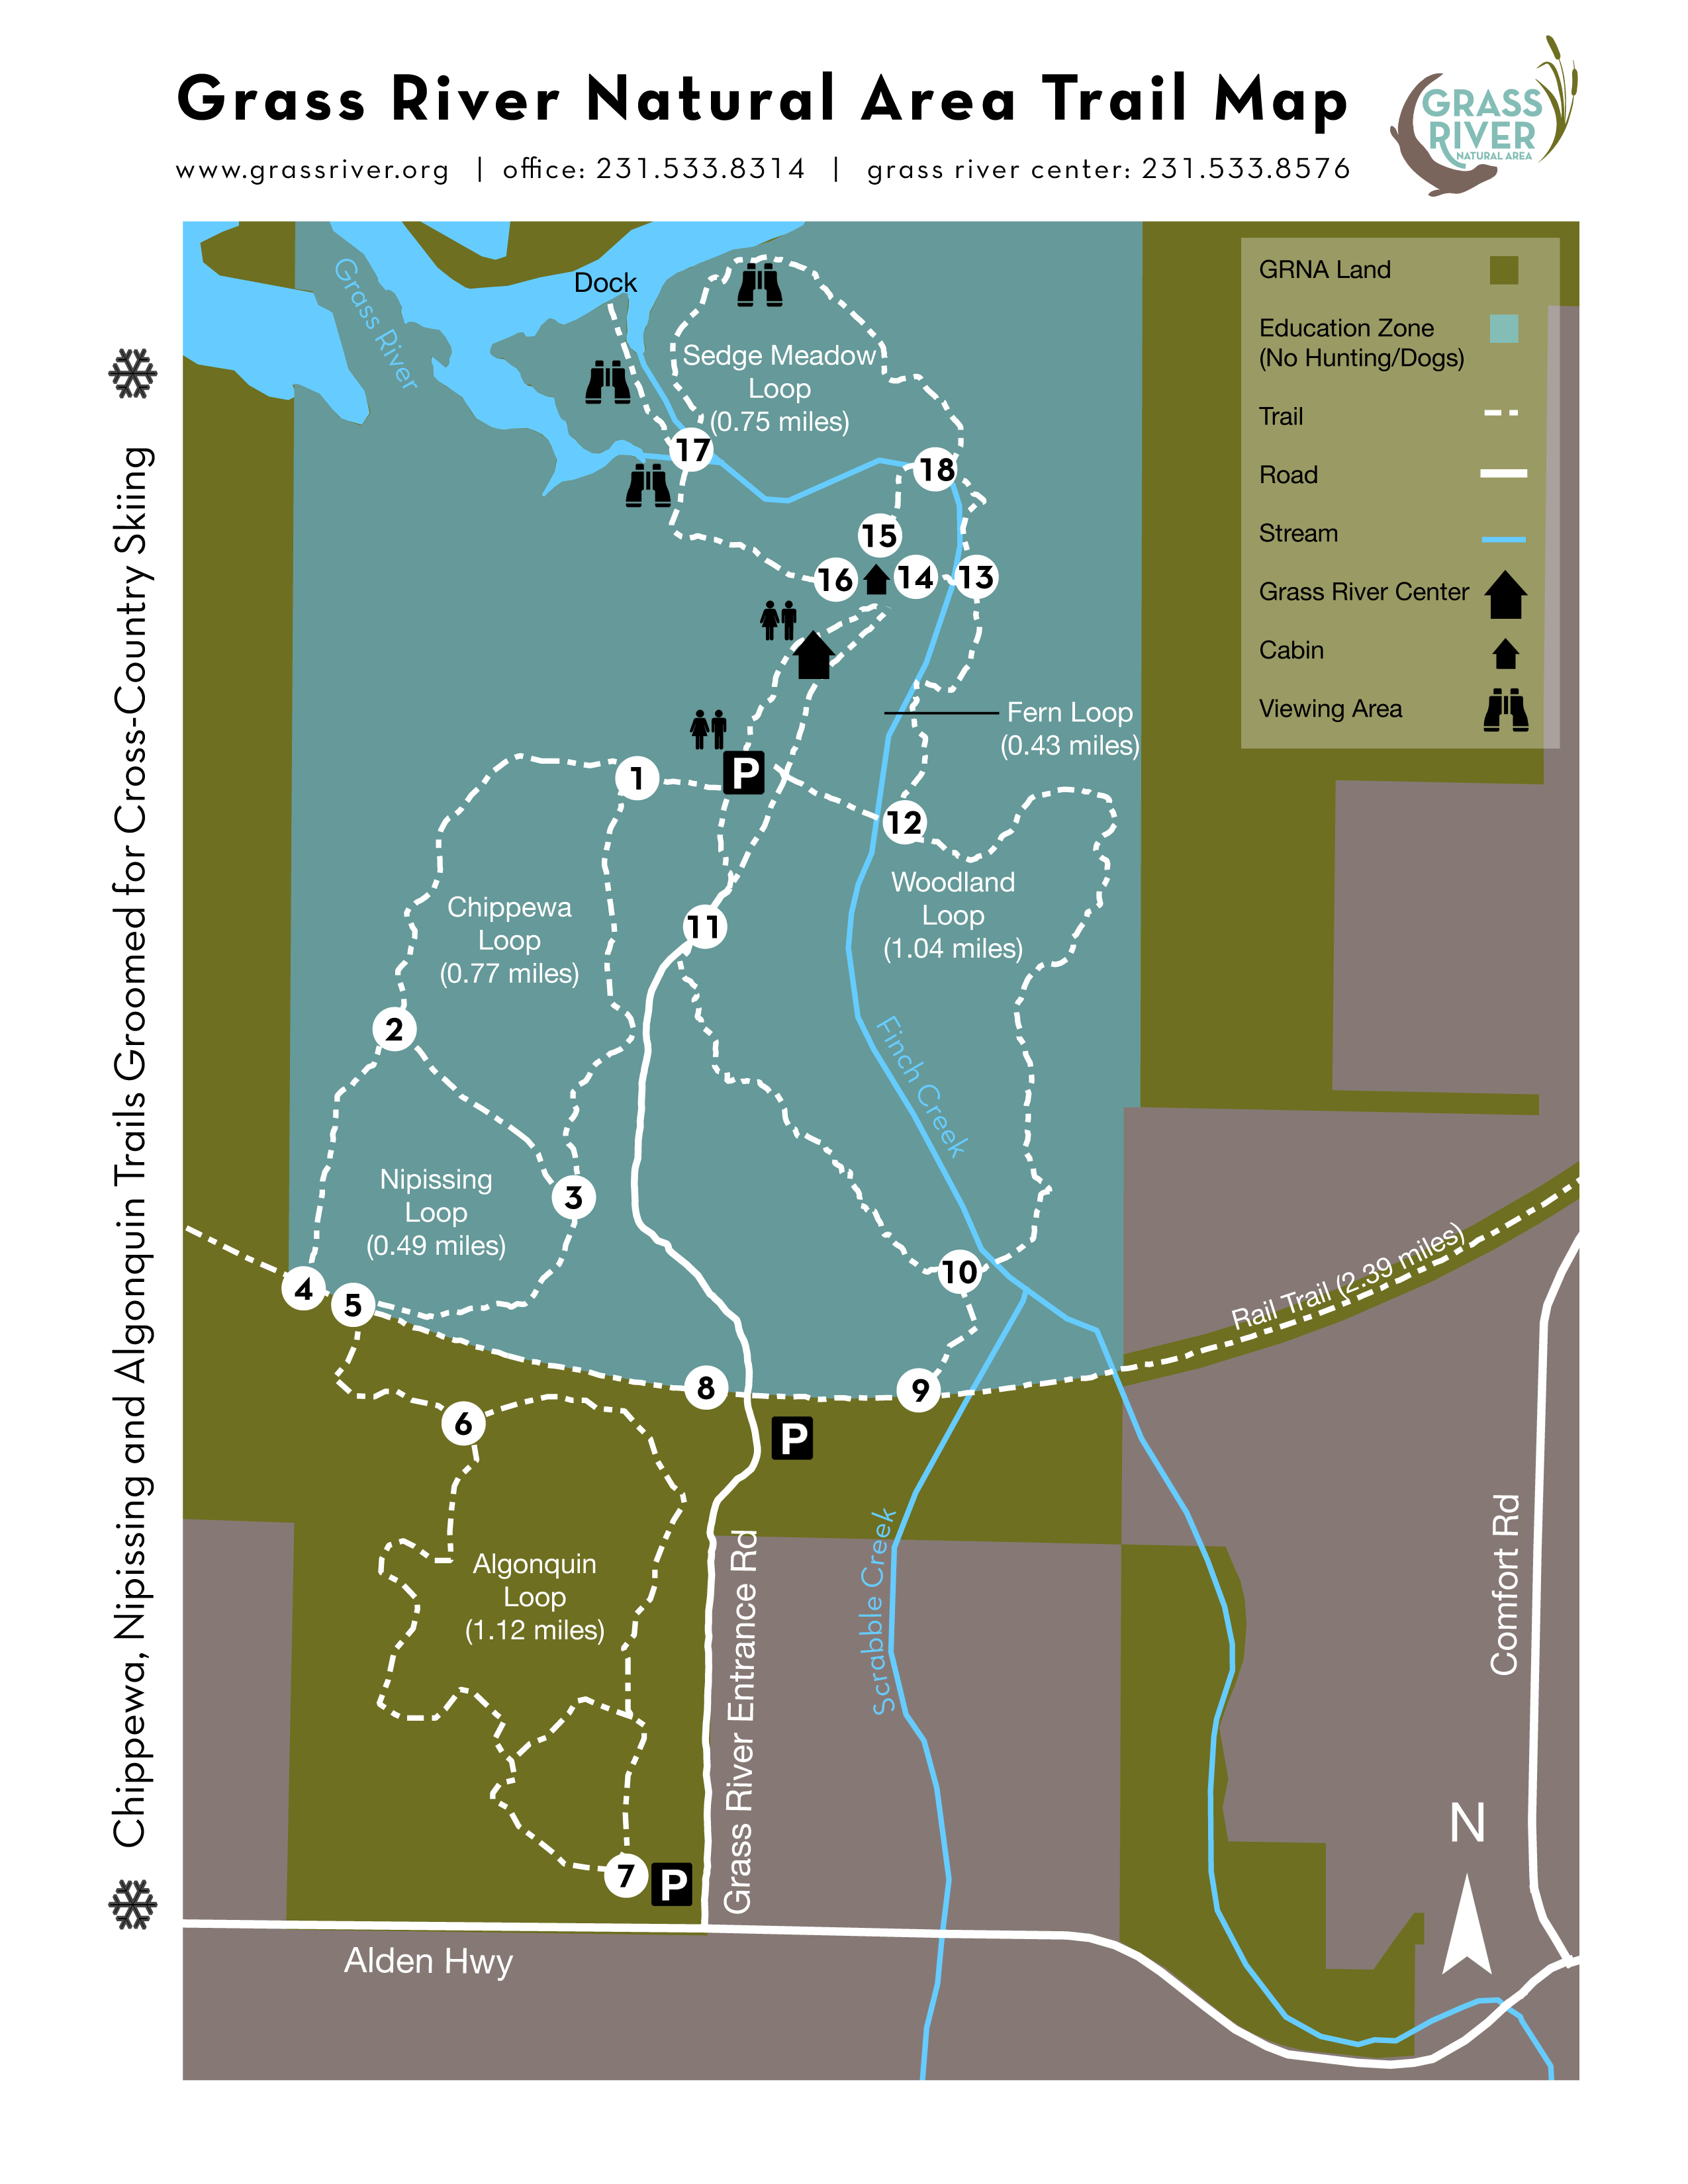 Hiking Trails, Nature Trails | Bellaire, Michigan Nature Preserve